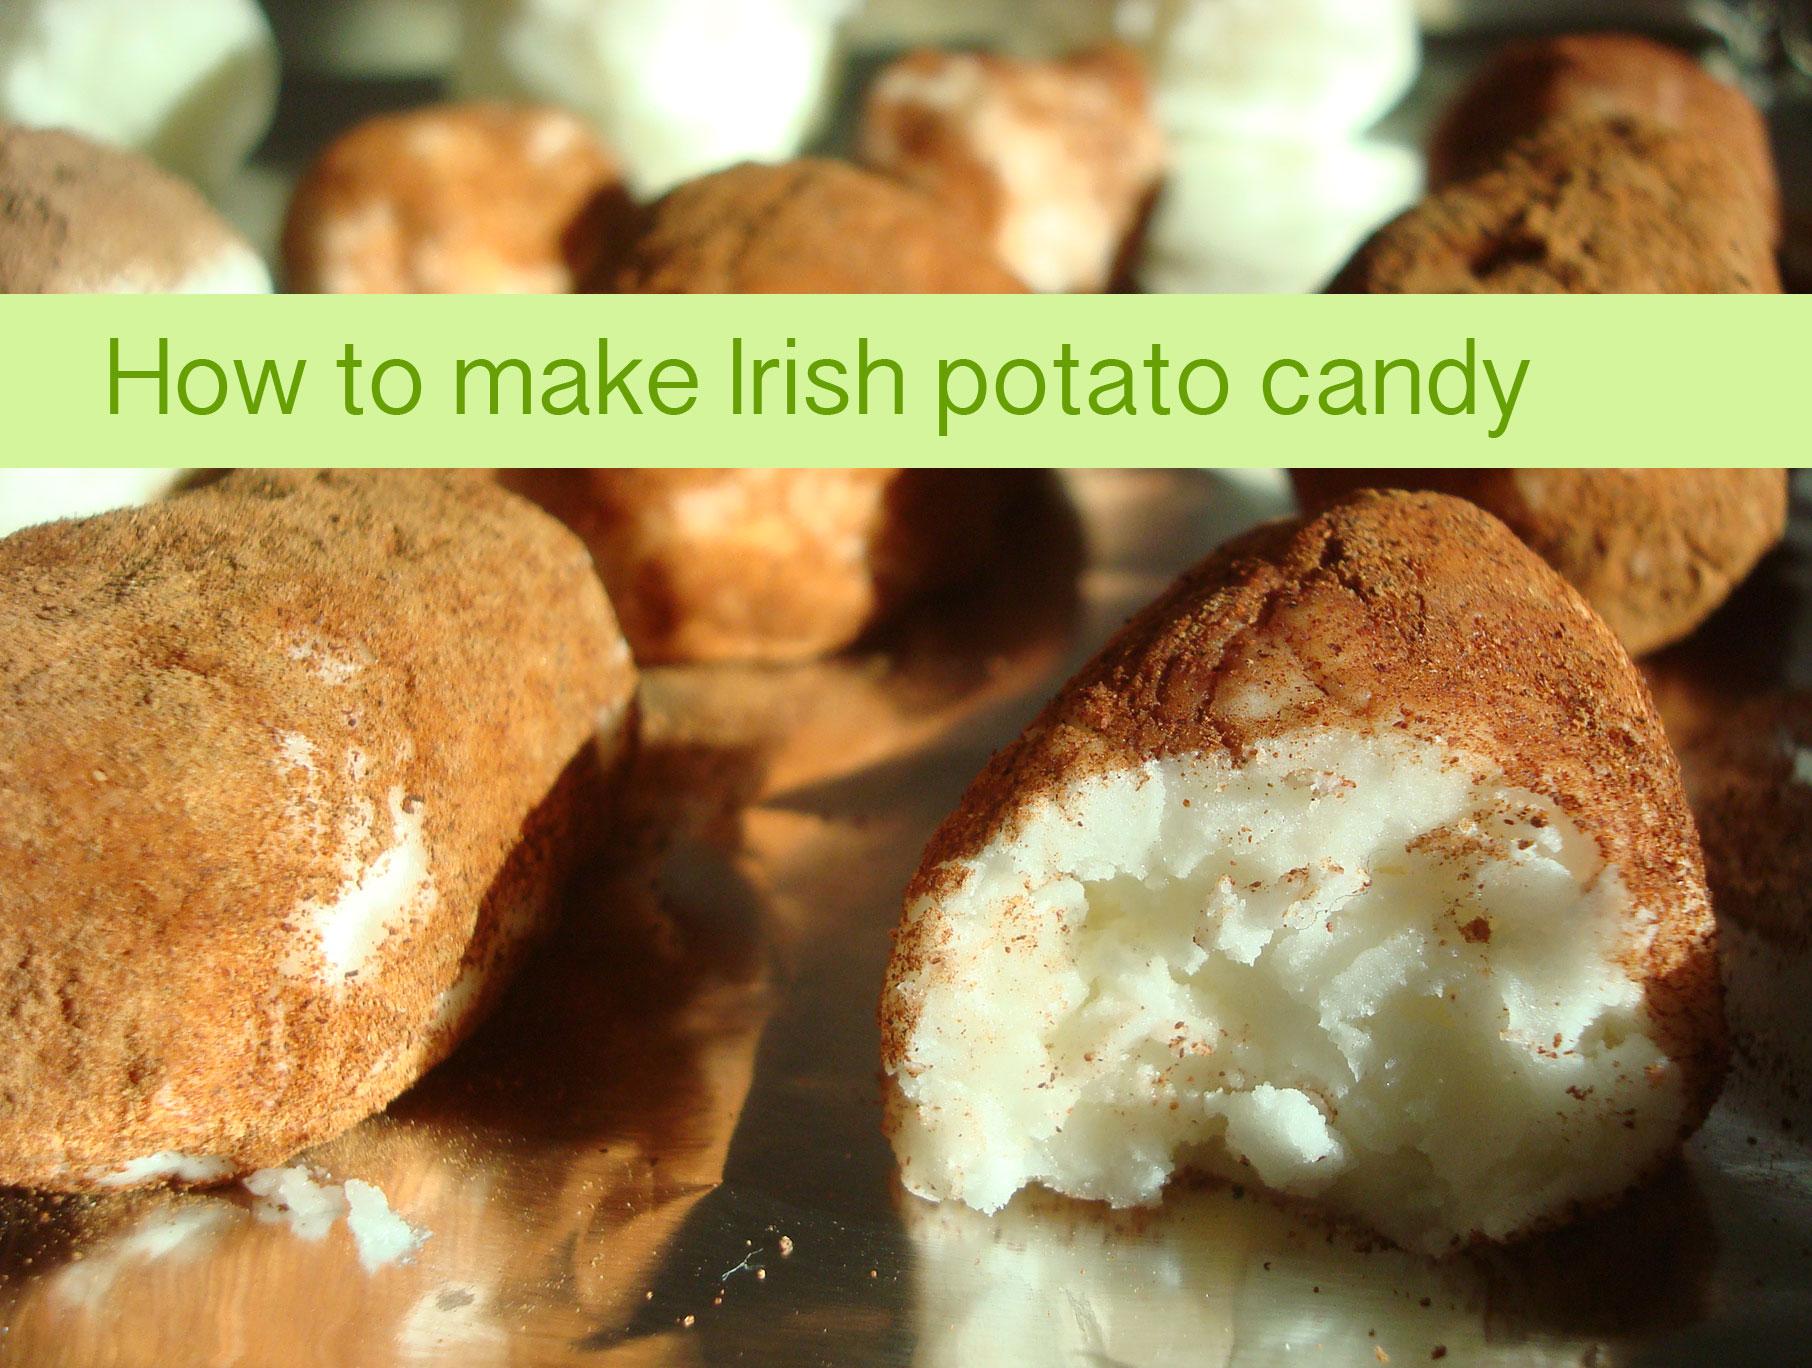 Making Homemade Irish Potato Candy on Bluprint.com